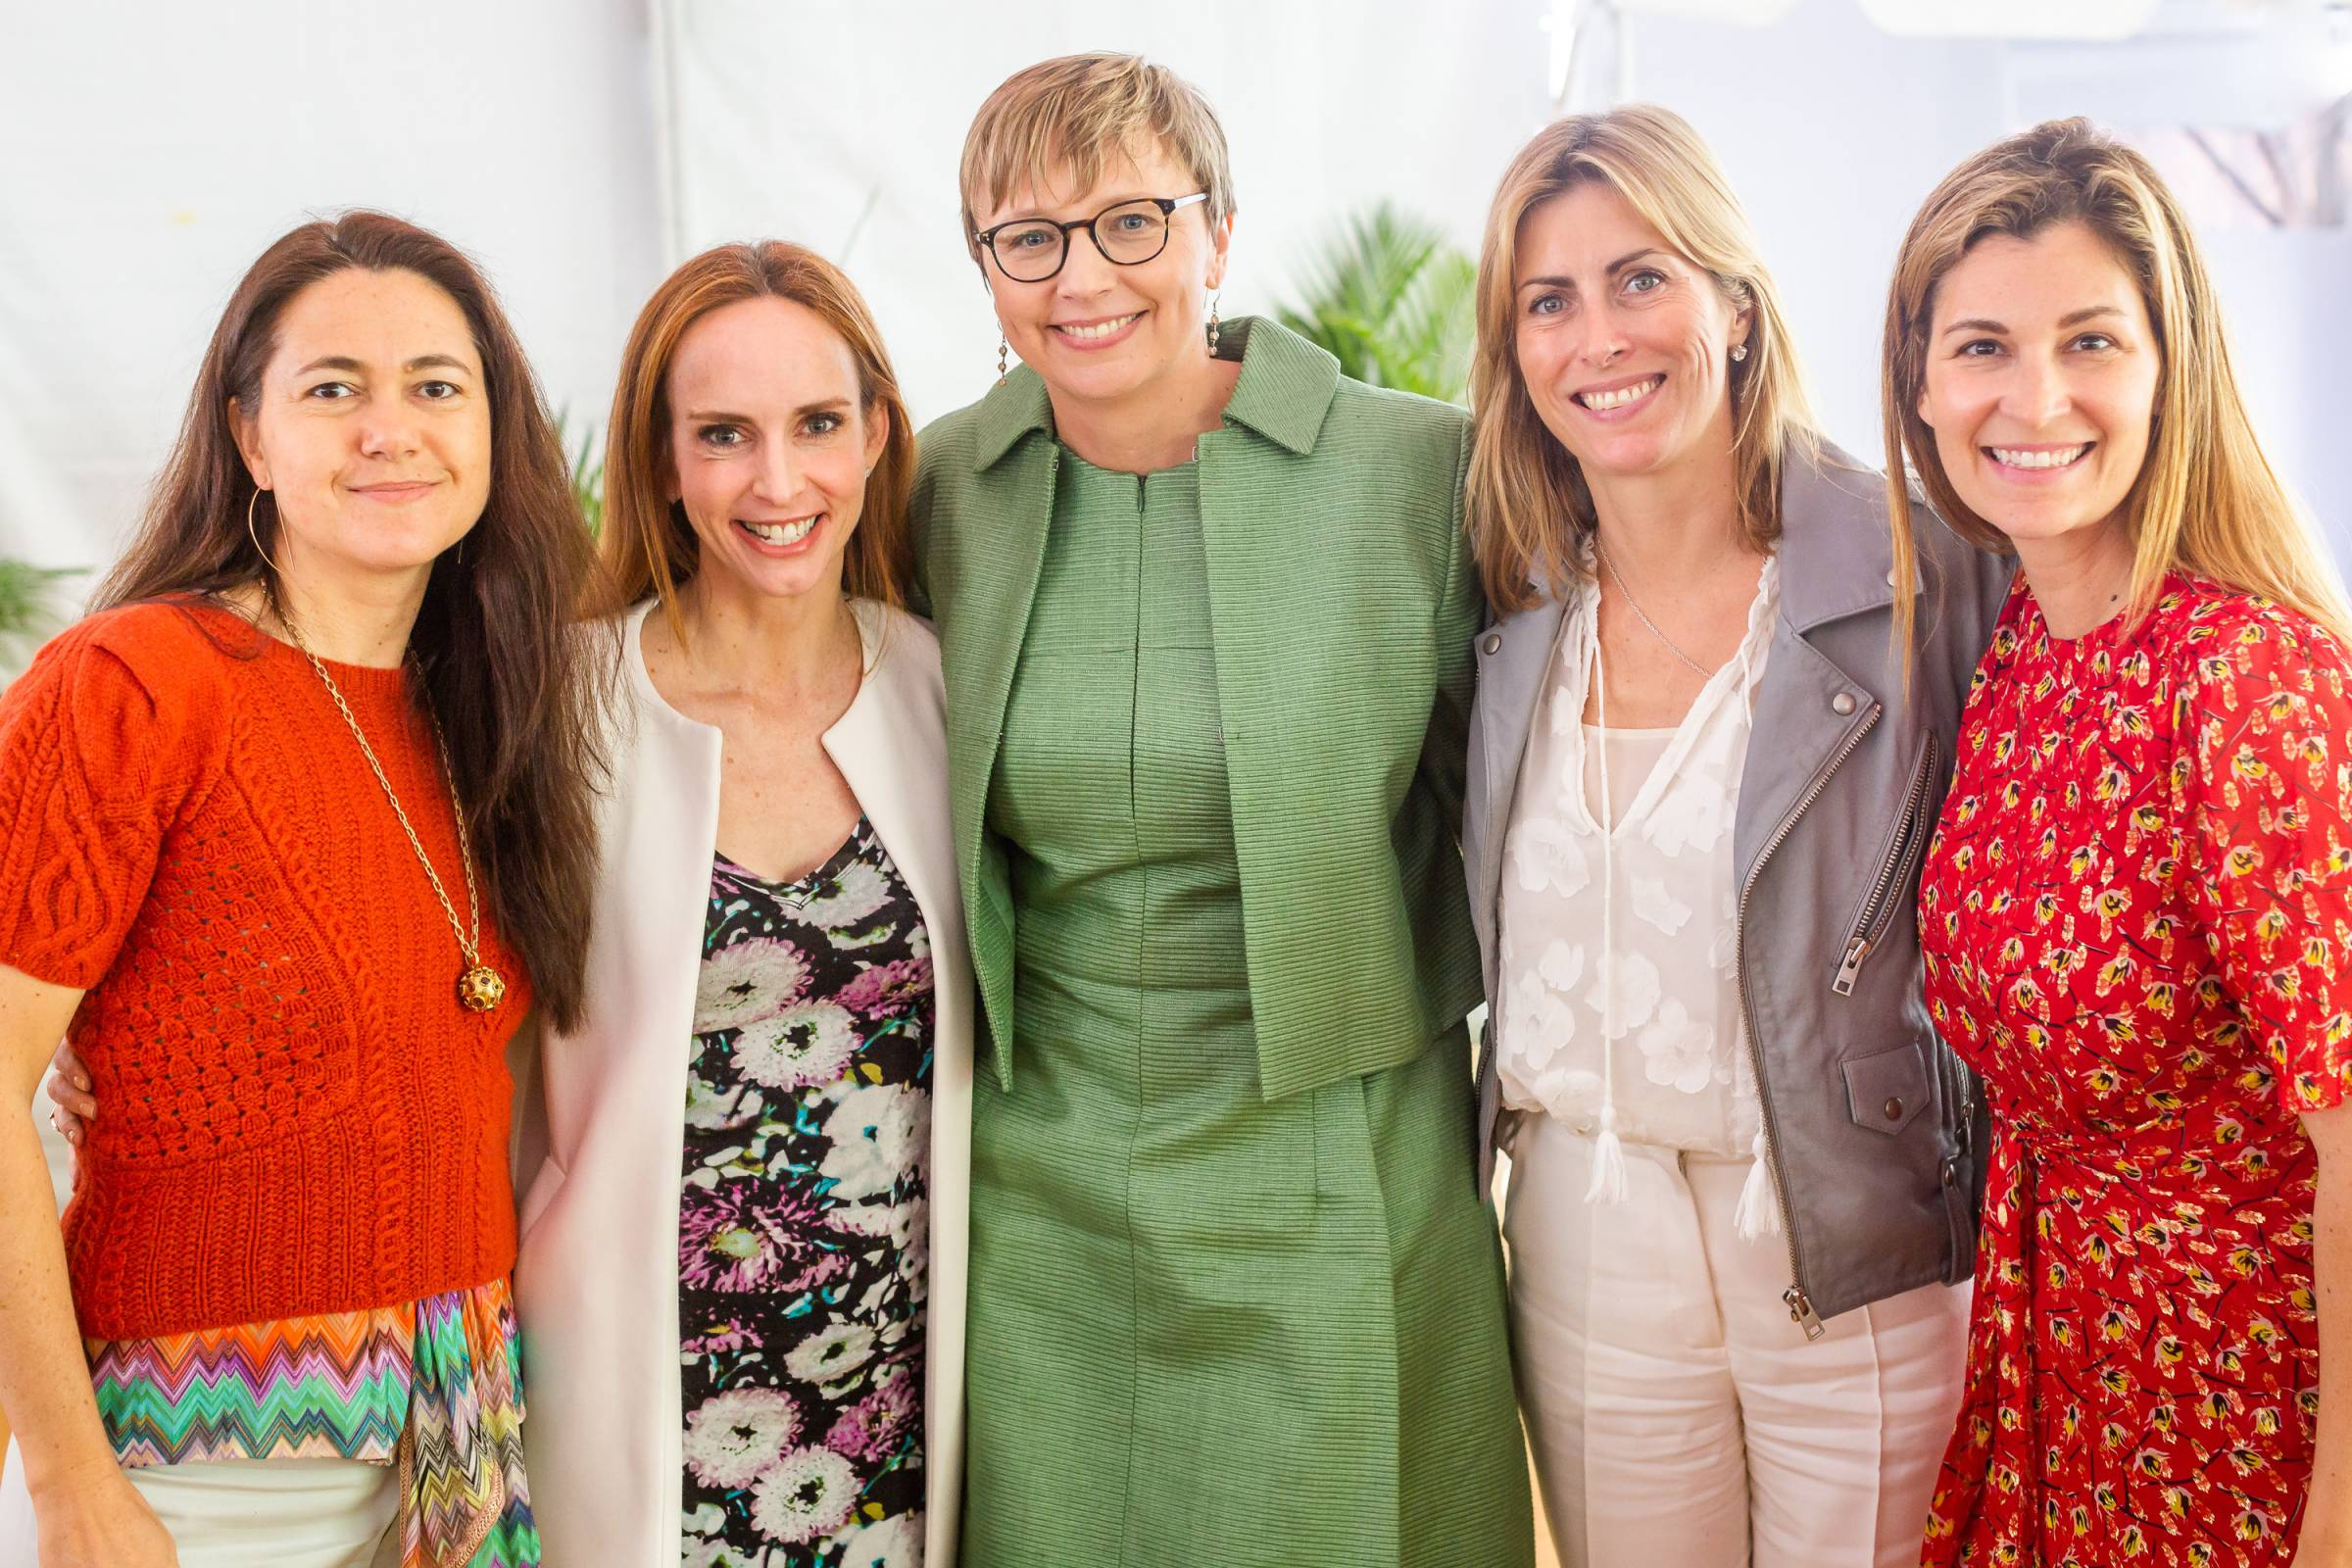 Alexandra Rowley, Faith Salie, Agata Smogorzewska, Tanya Simon, Nicole Palame